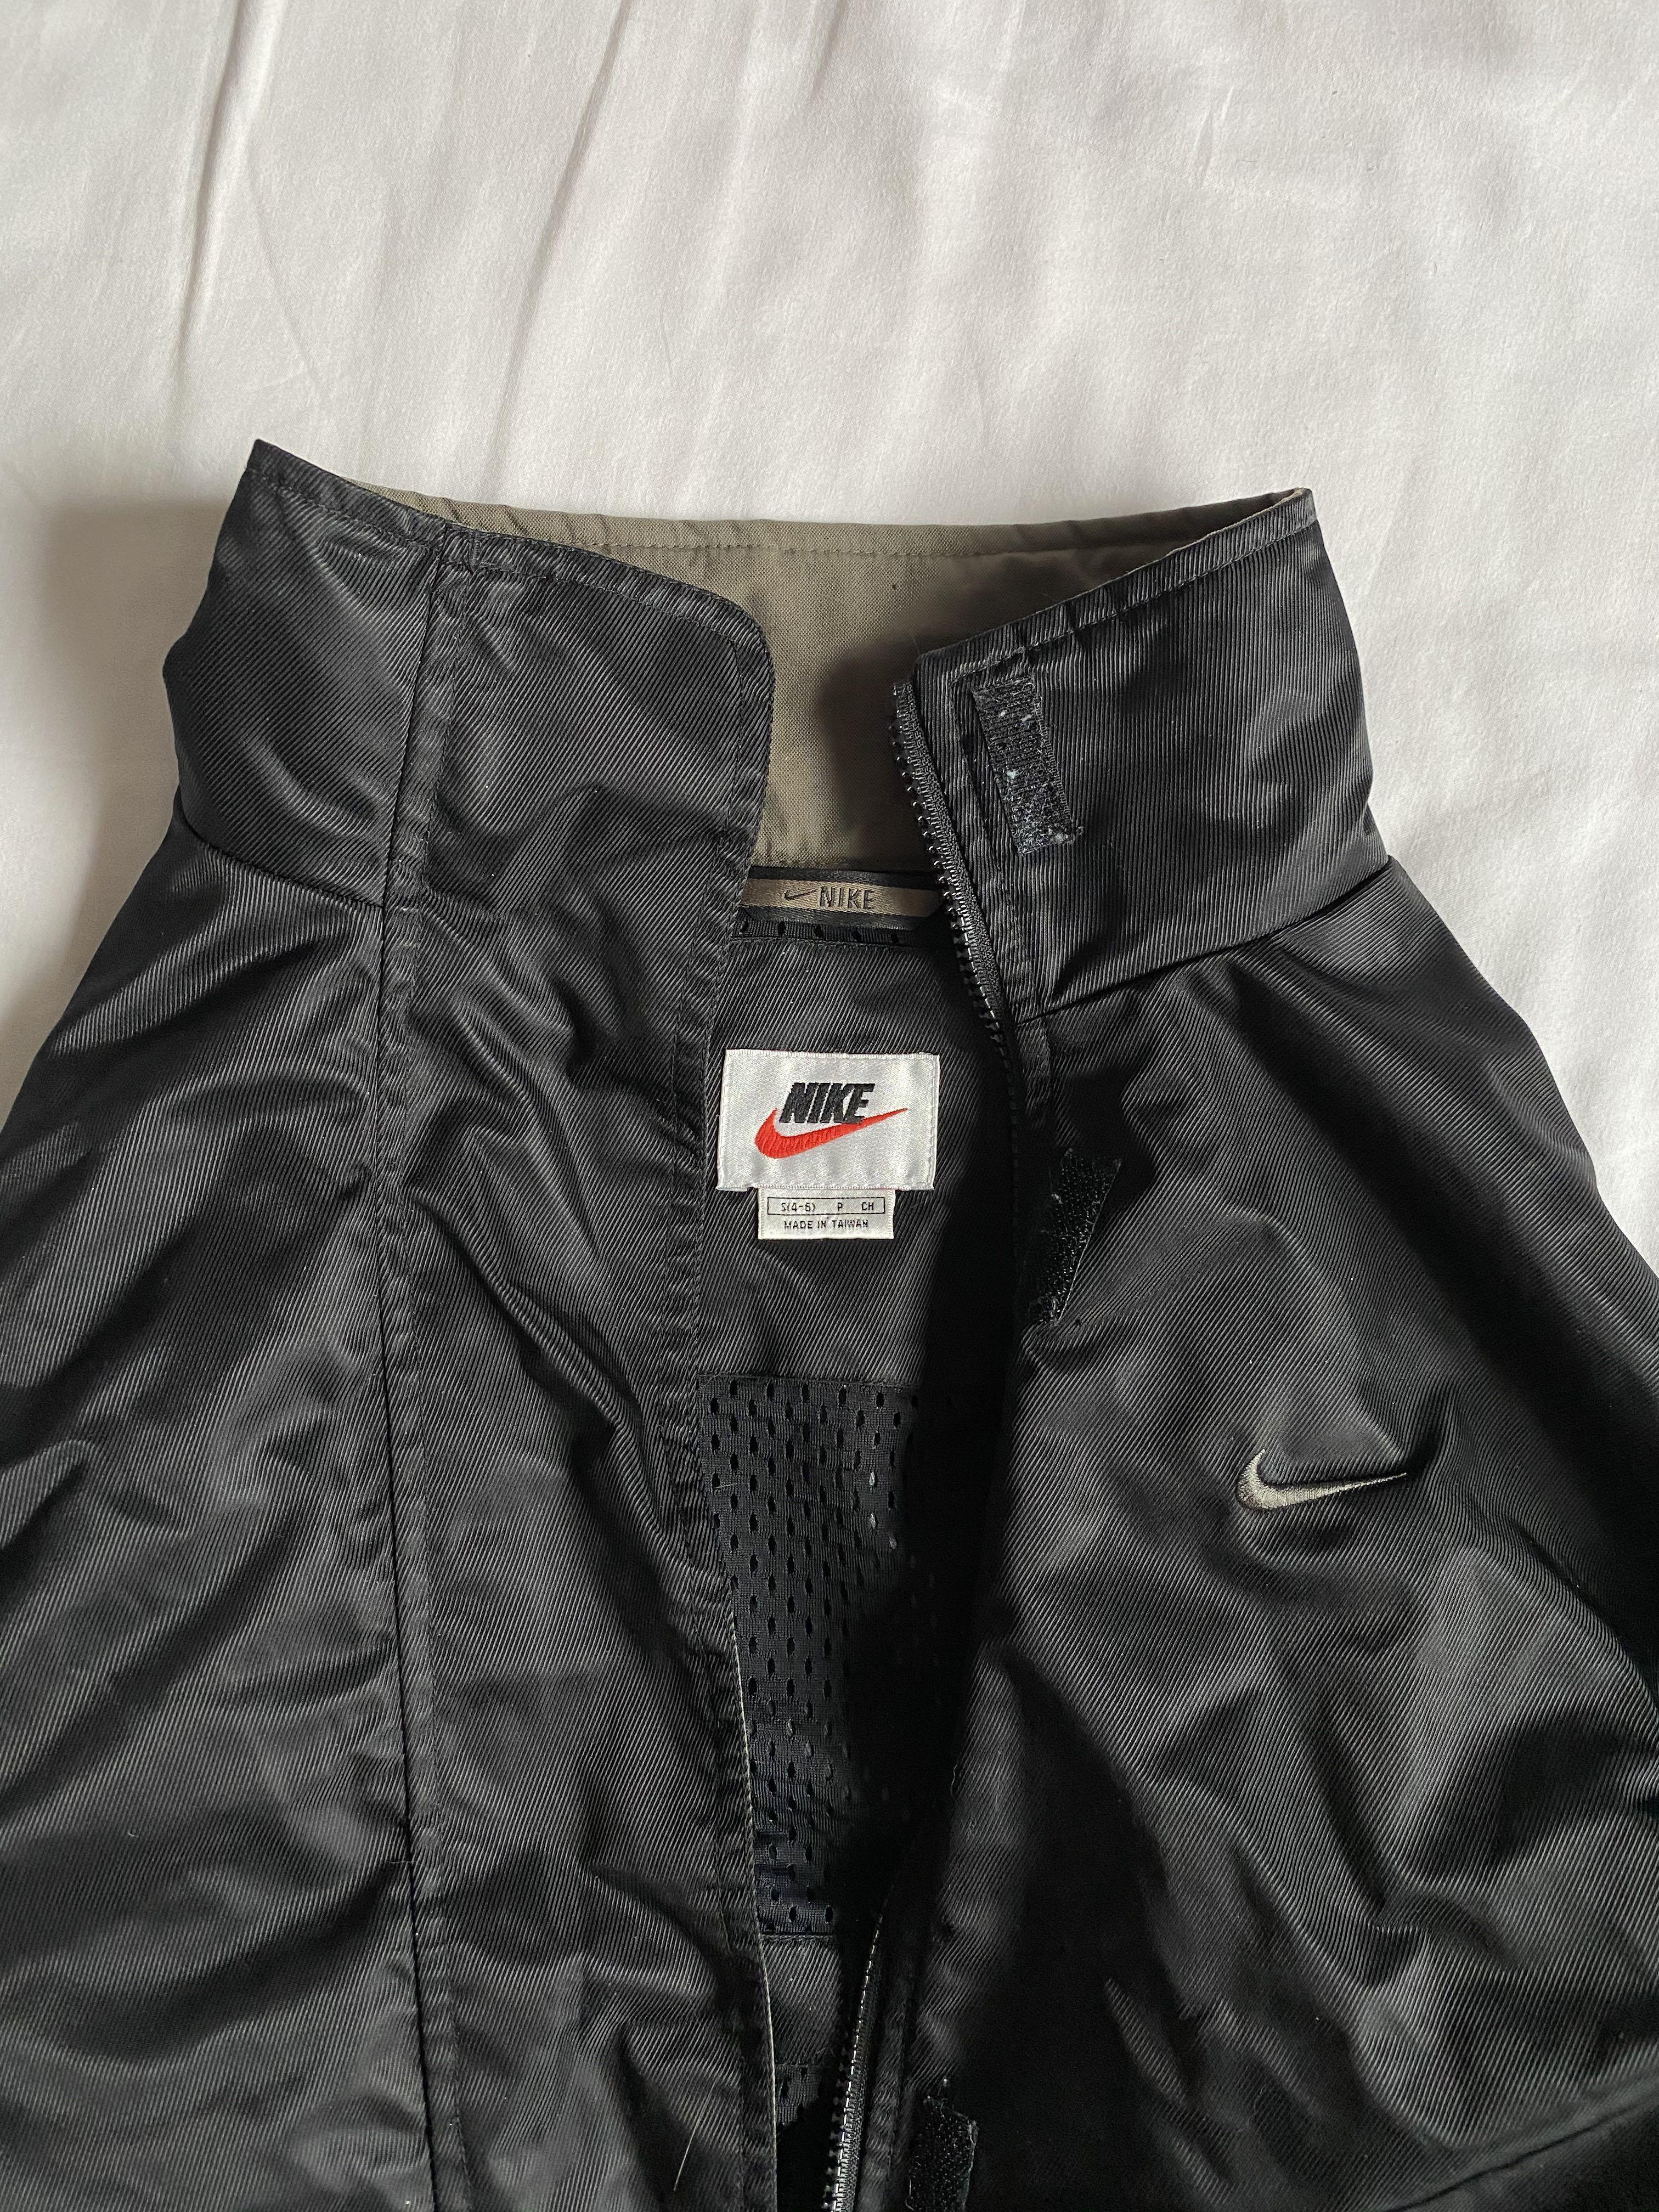 Nike Windbreaker (90's/2000's) Shine